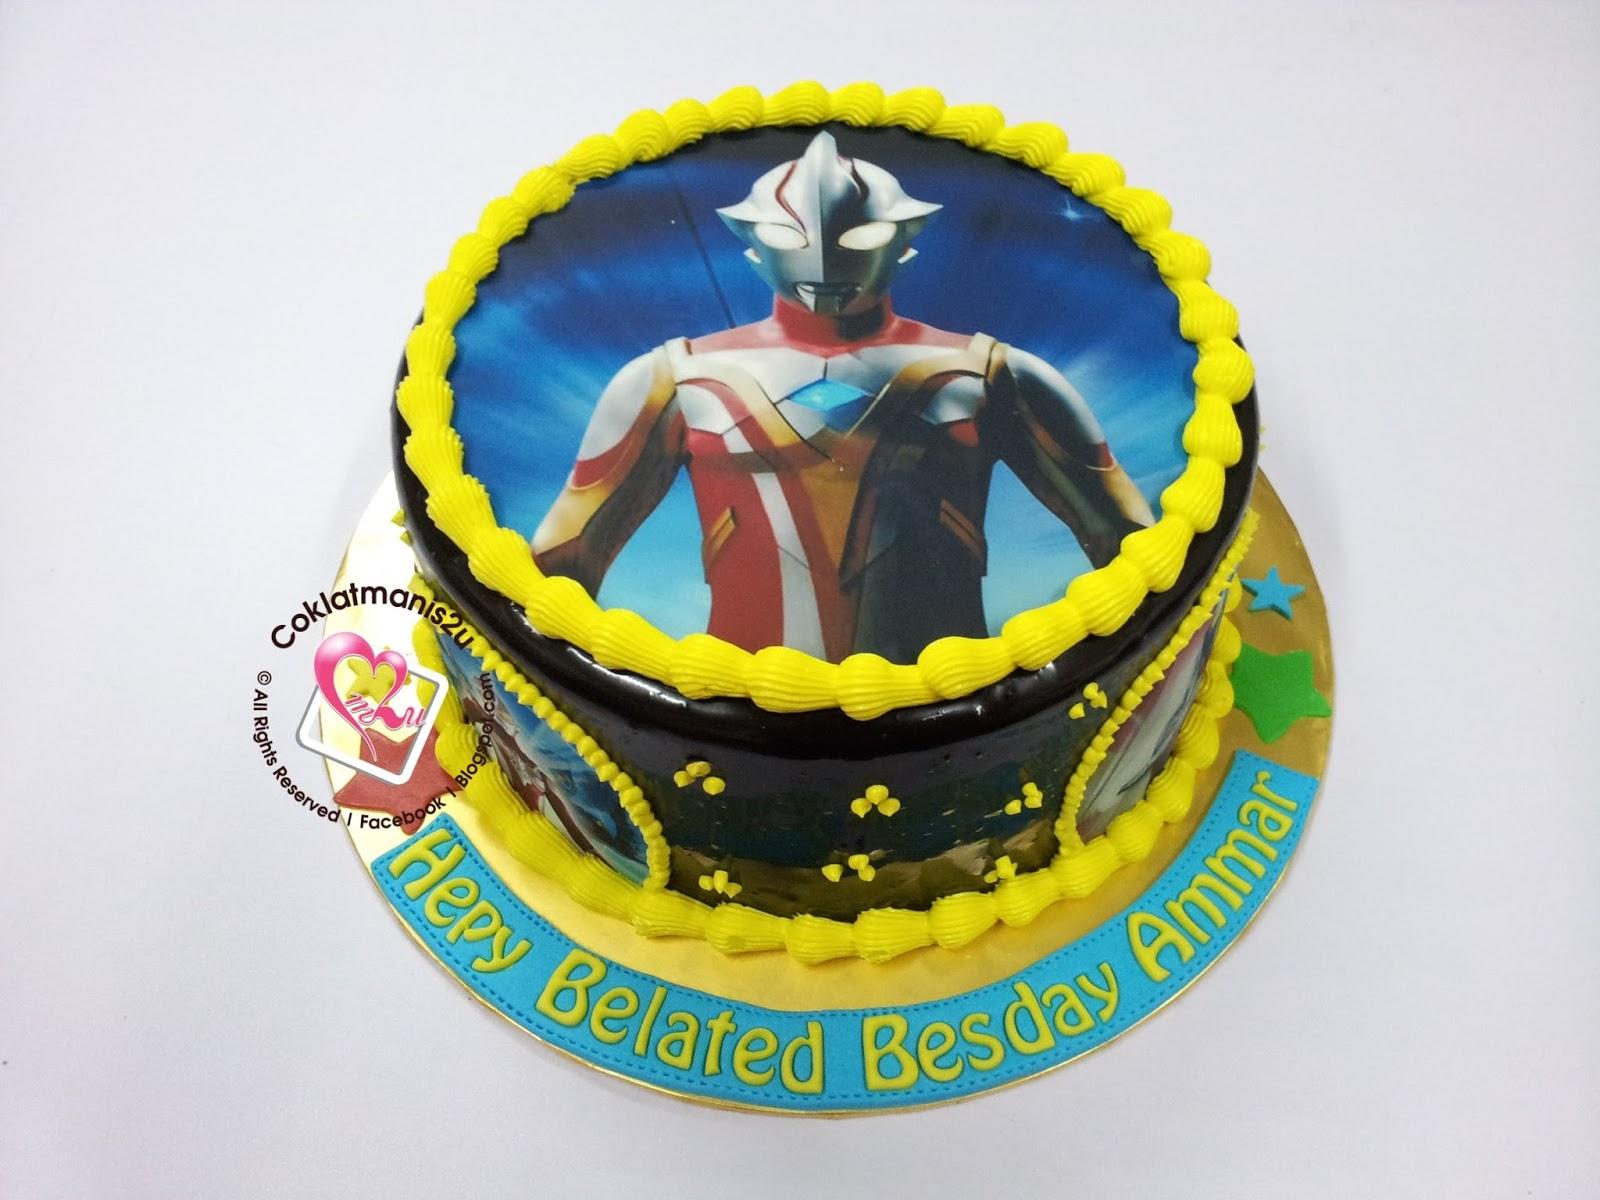 coklatmanis2u Birthday Cake Edible Image Ultraman